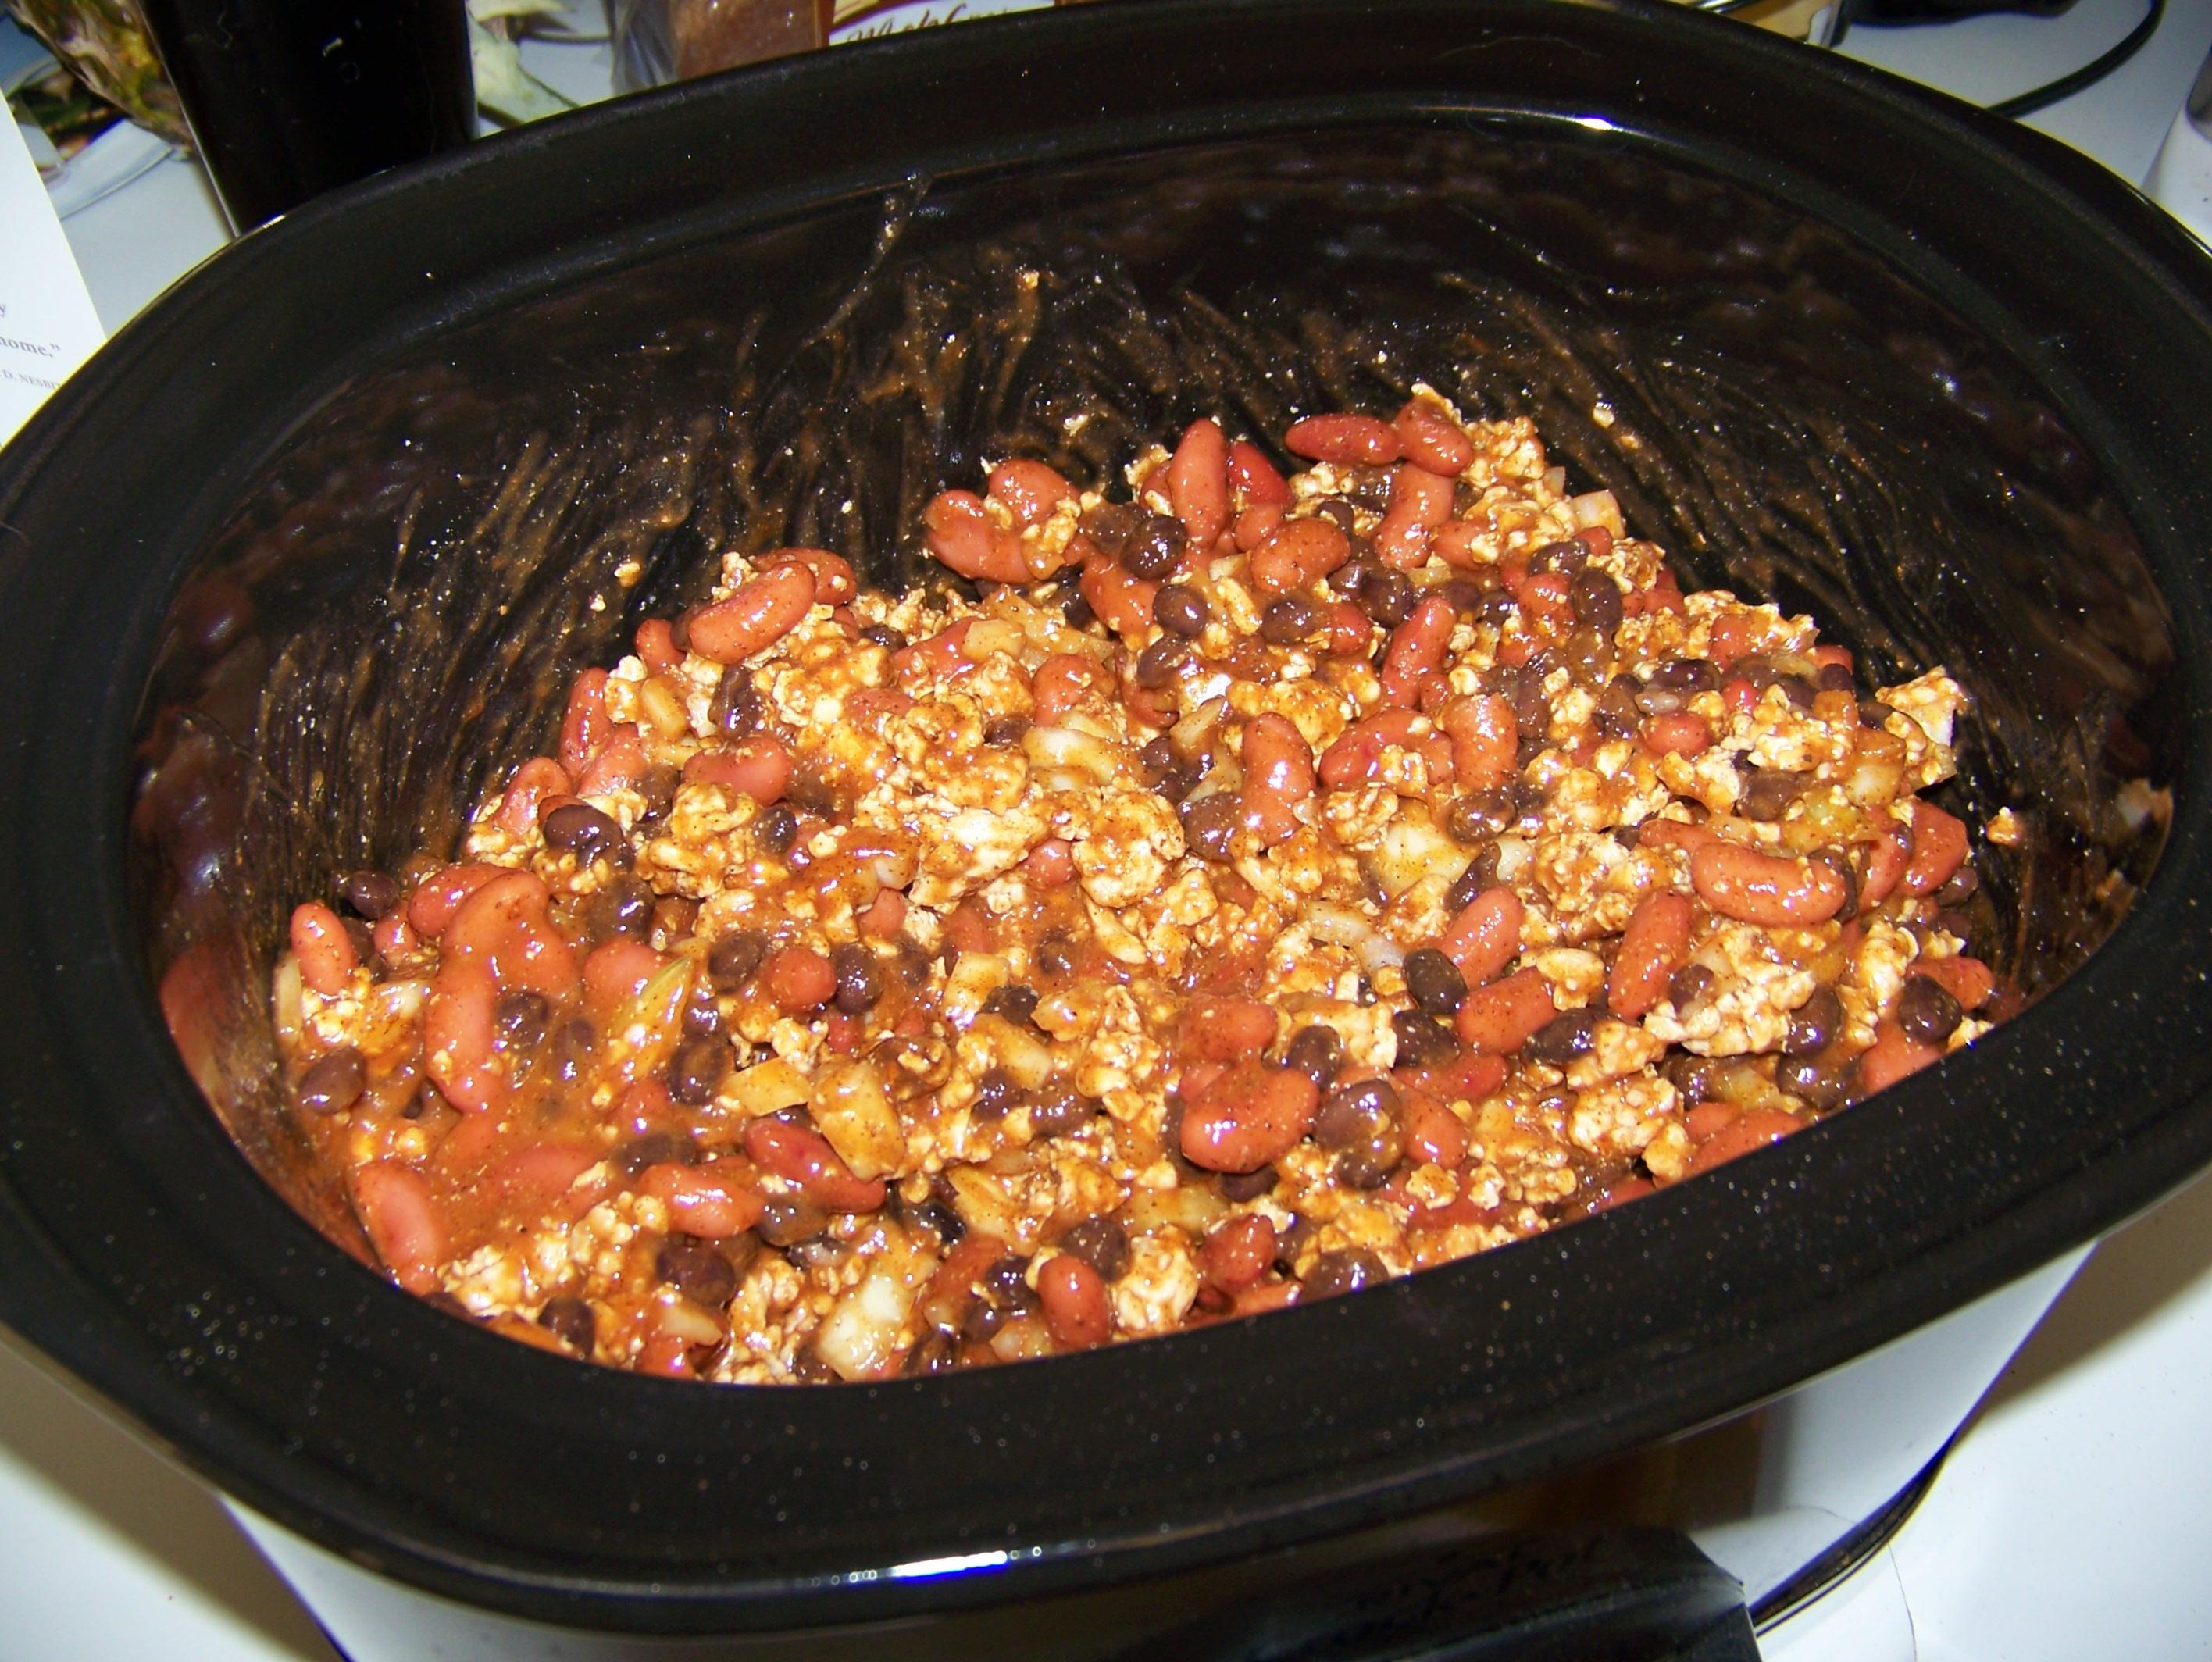 Healthy Ground Beef Crock Pot Recipes  Crock Pot Recipes Chicken Beef with Ground Beef Easy